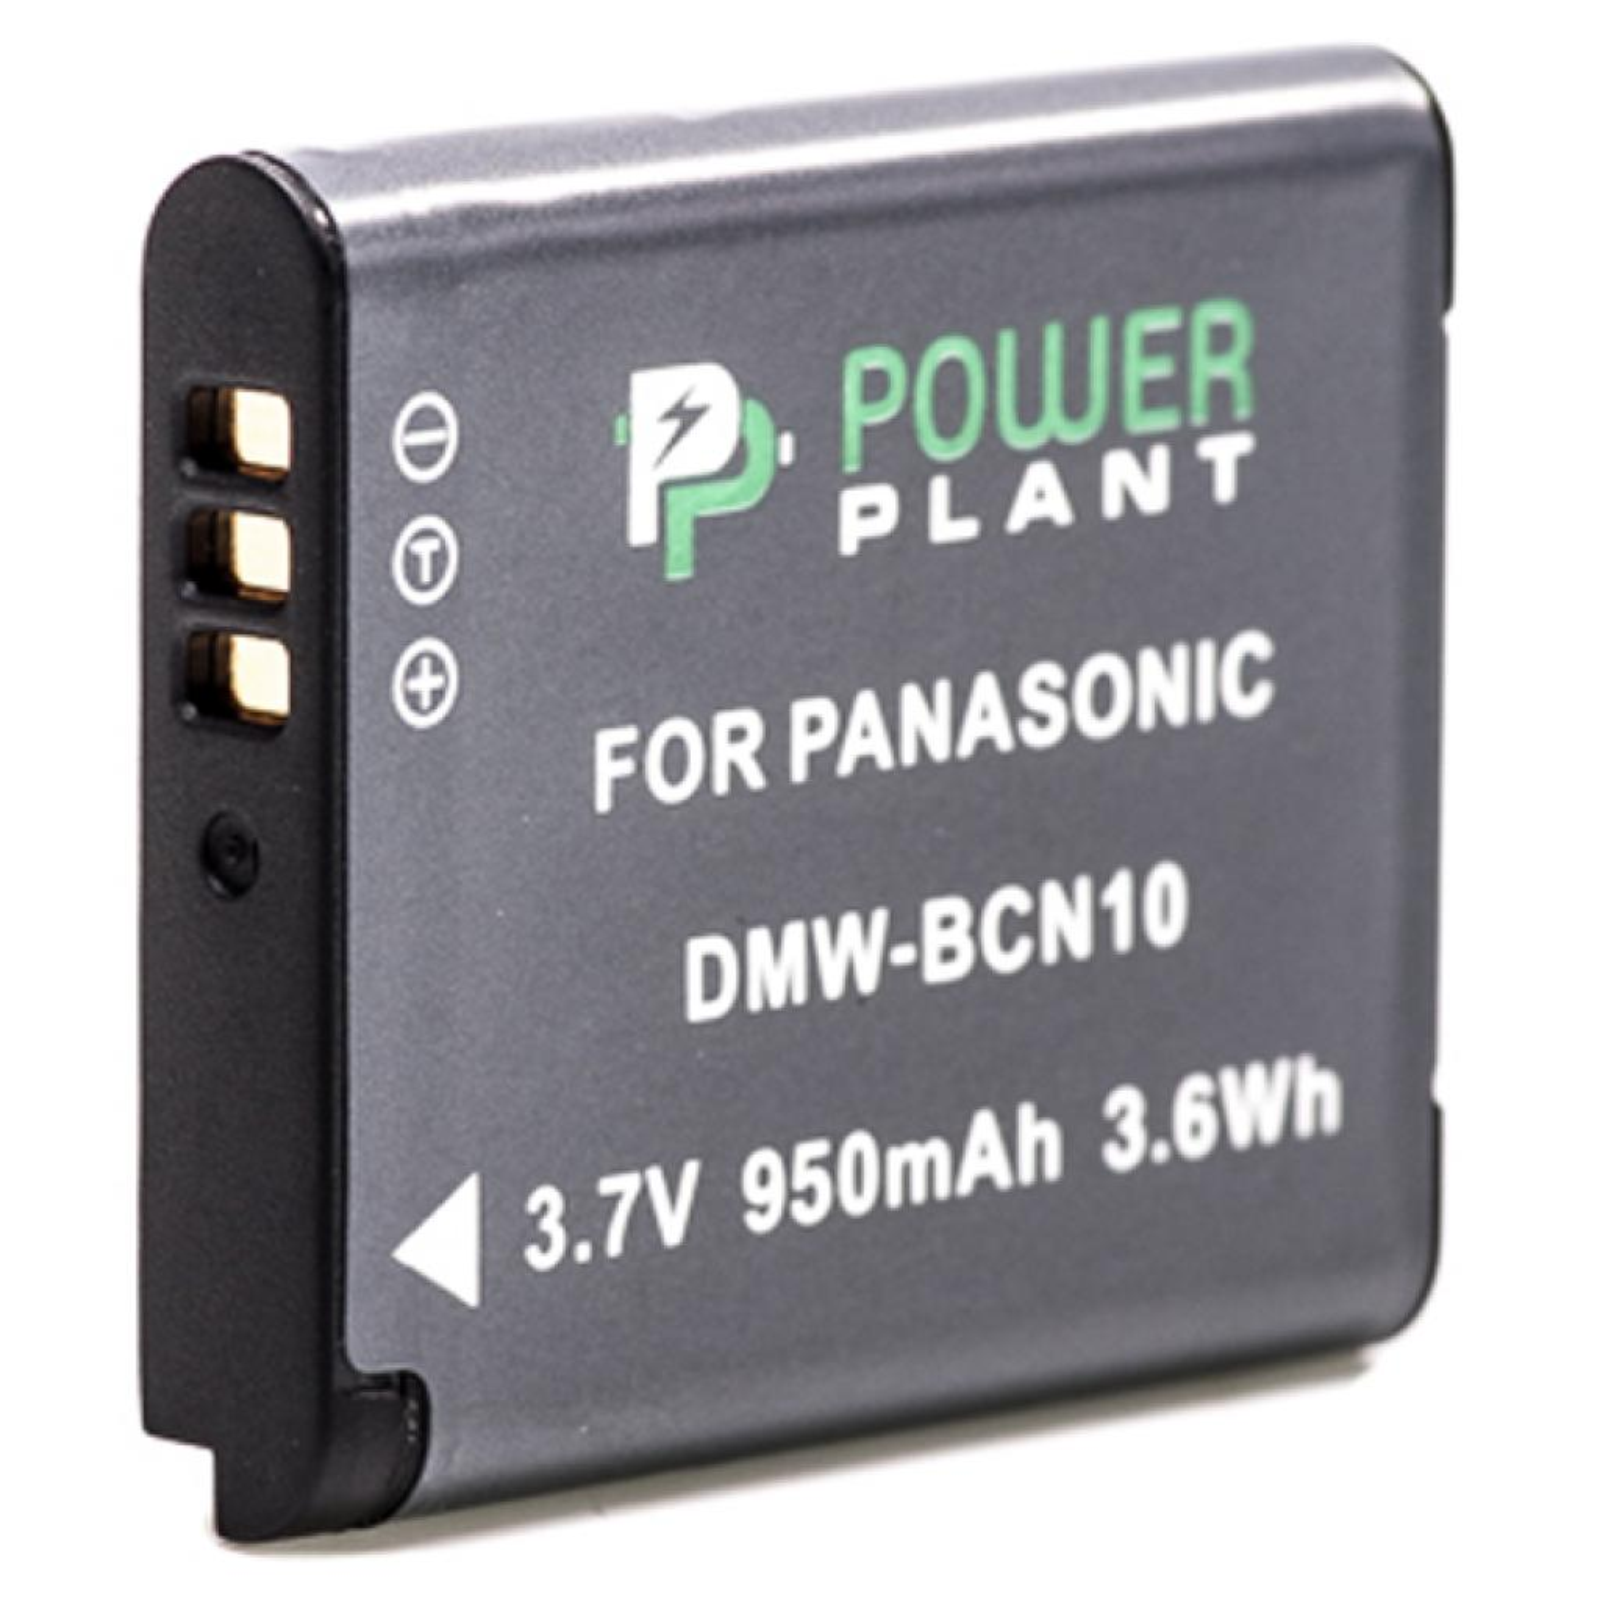 Аккумулятор к фото/видео PowerPlant Panasonic DMW-BCN10 (DV00DV1378) изображение 2